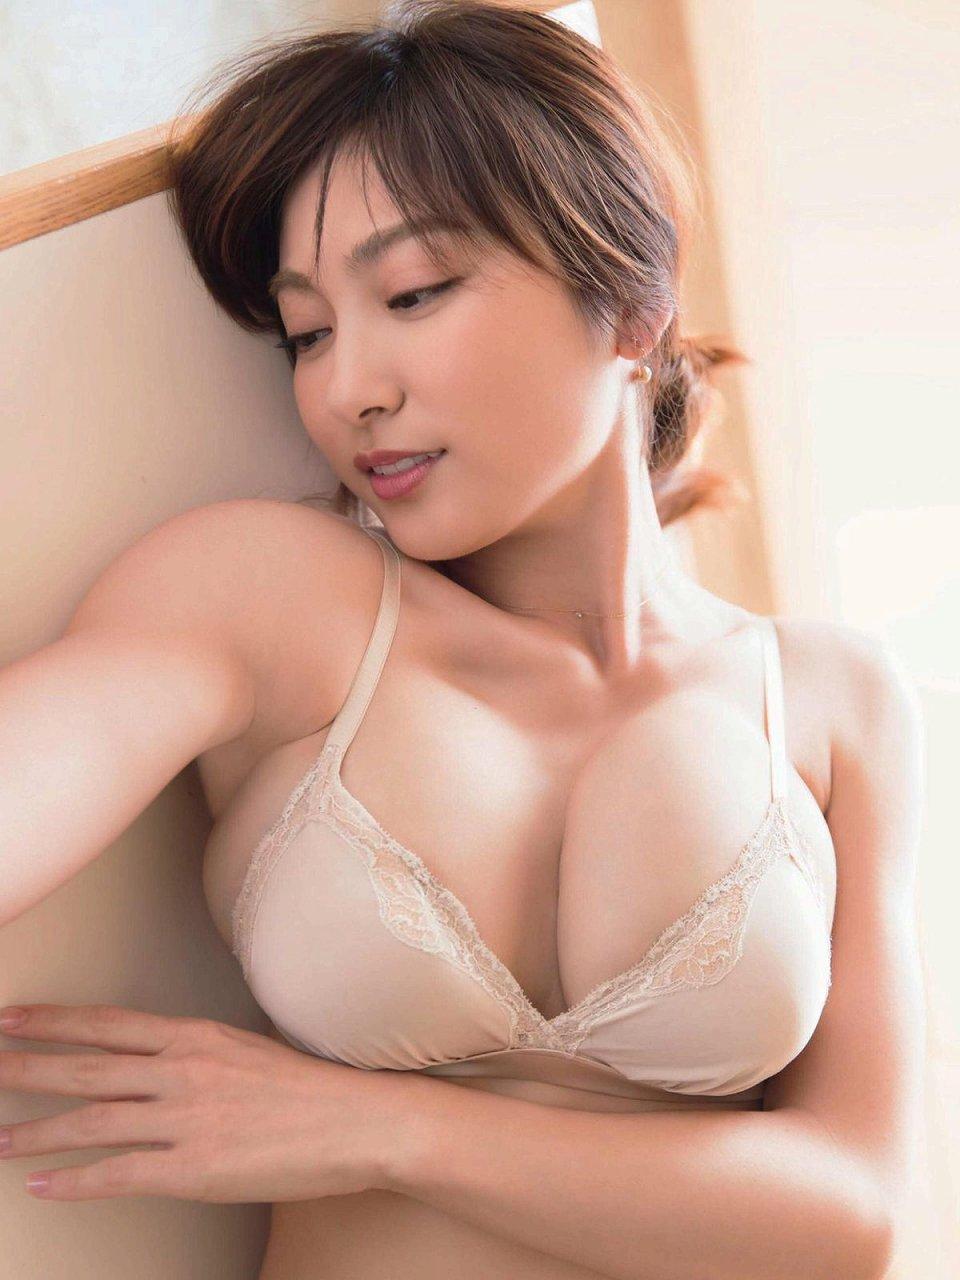 「FRIDAY(フライデー) 2017年 3/3 号」熊田曜子の下着グラビア